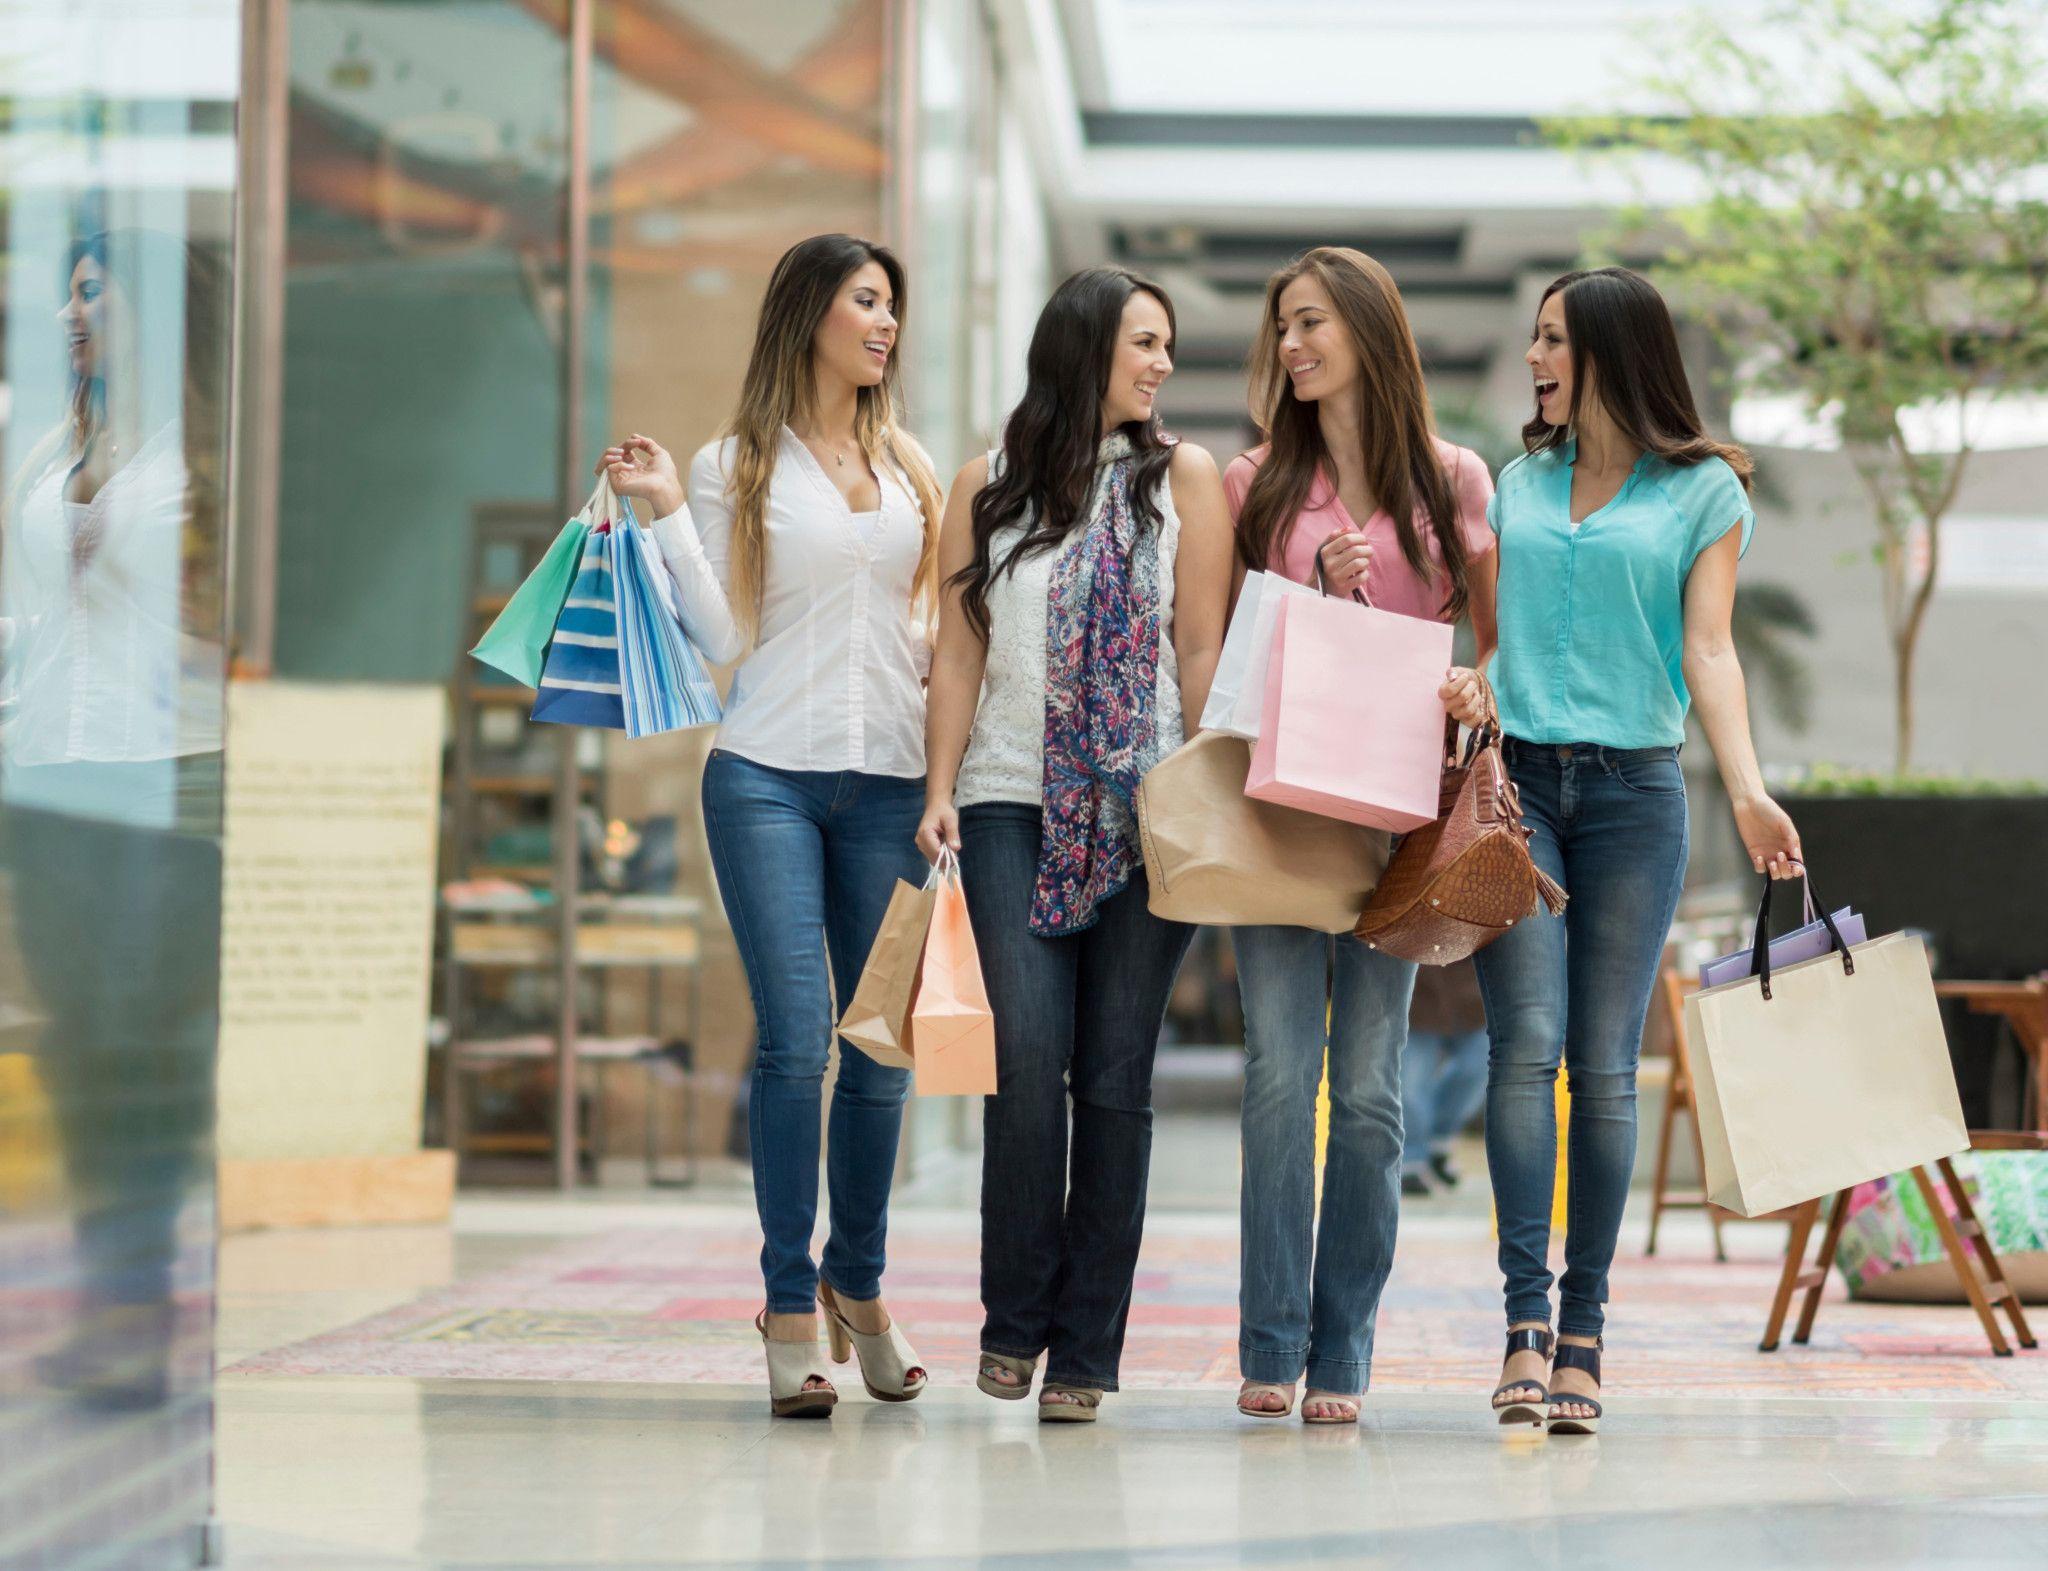 Loja online para comprar roupa de marca sempre com grandes